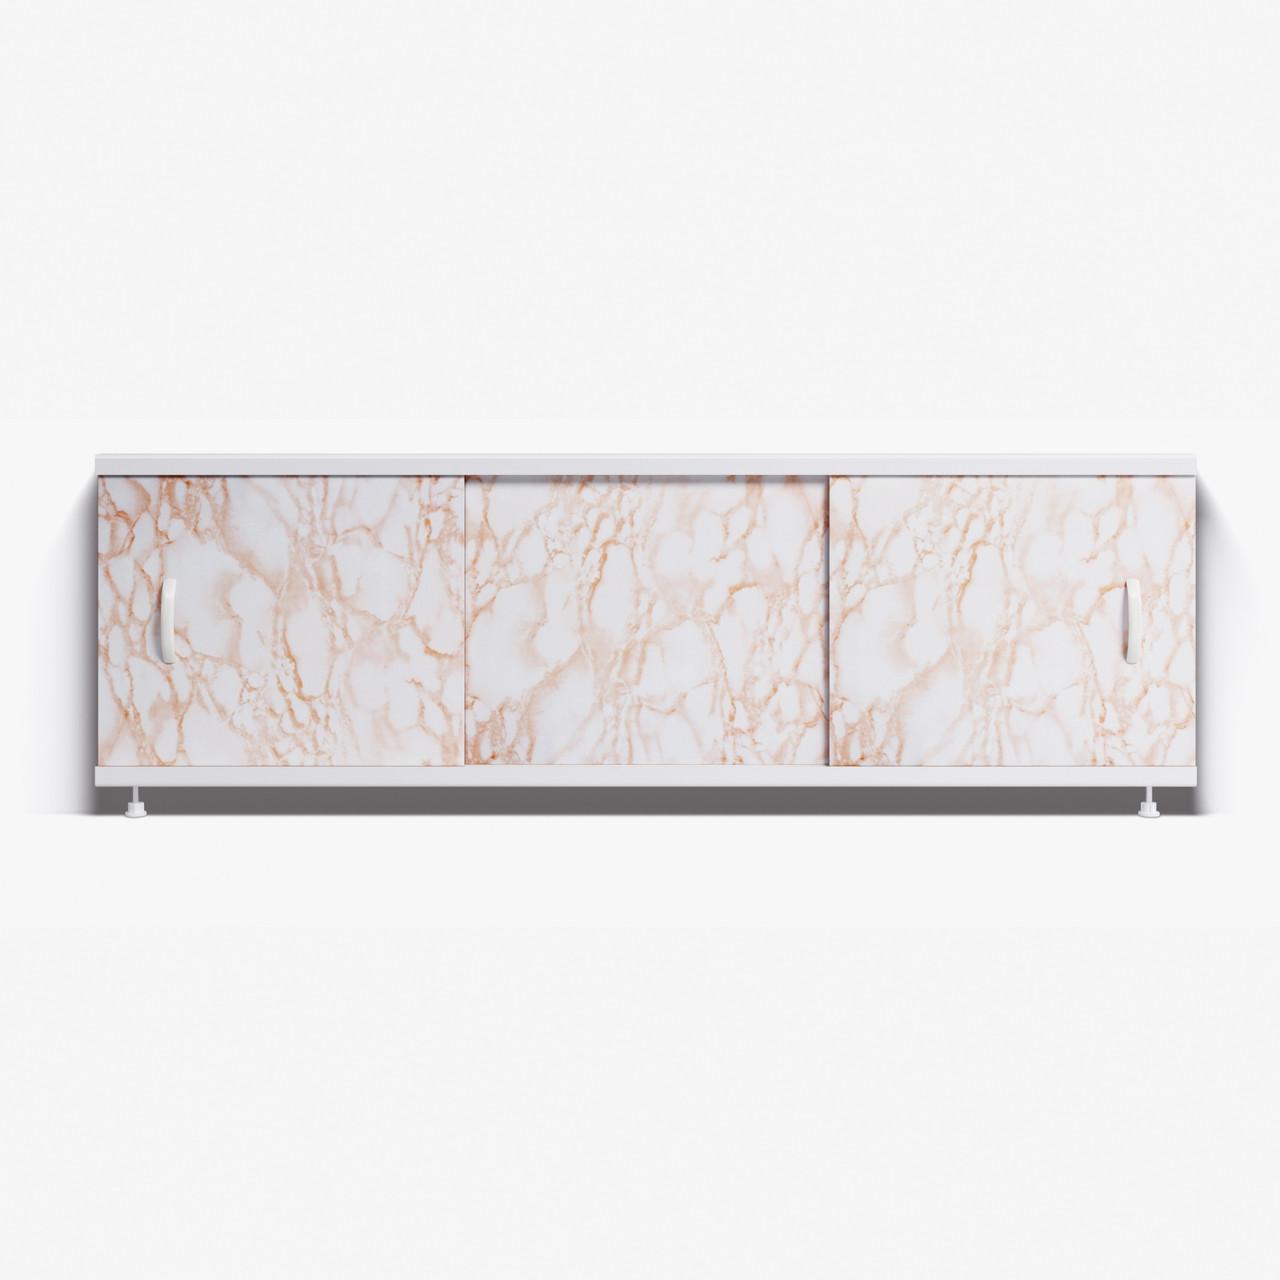 Панель для ванны Alavann ОПТИМА 1.7 м  //  2 кремовый мрамор